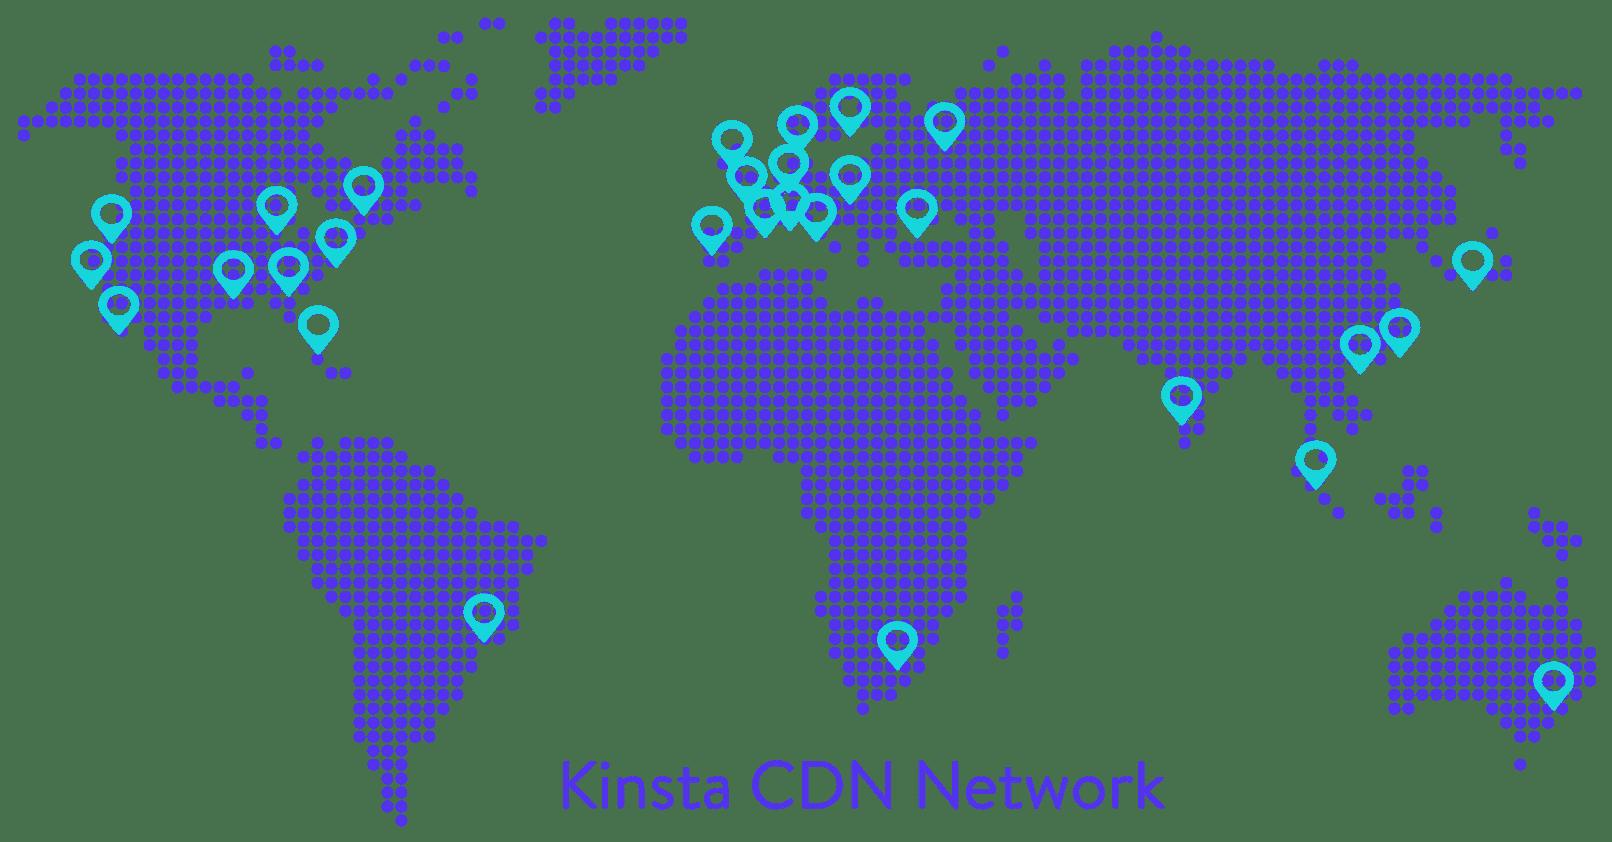 Kinsta CDN network